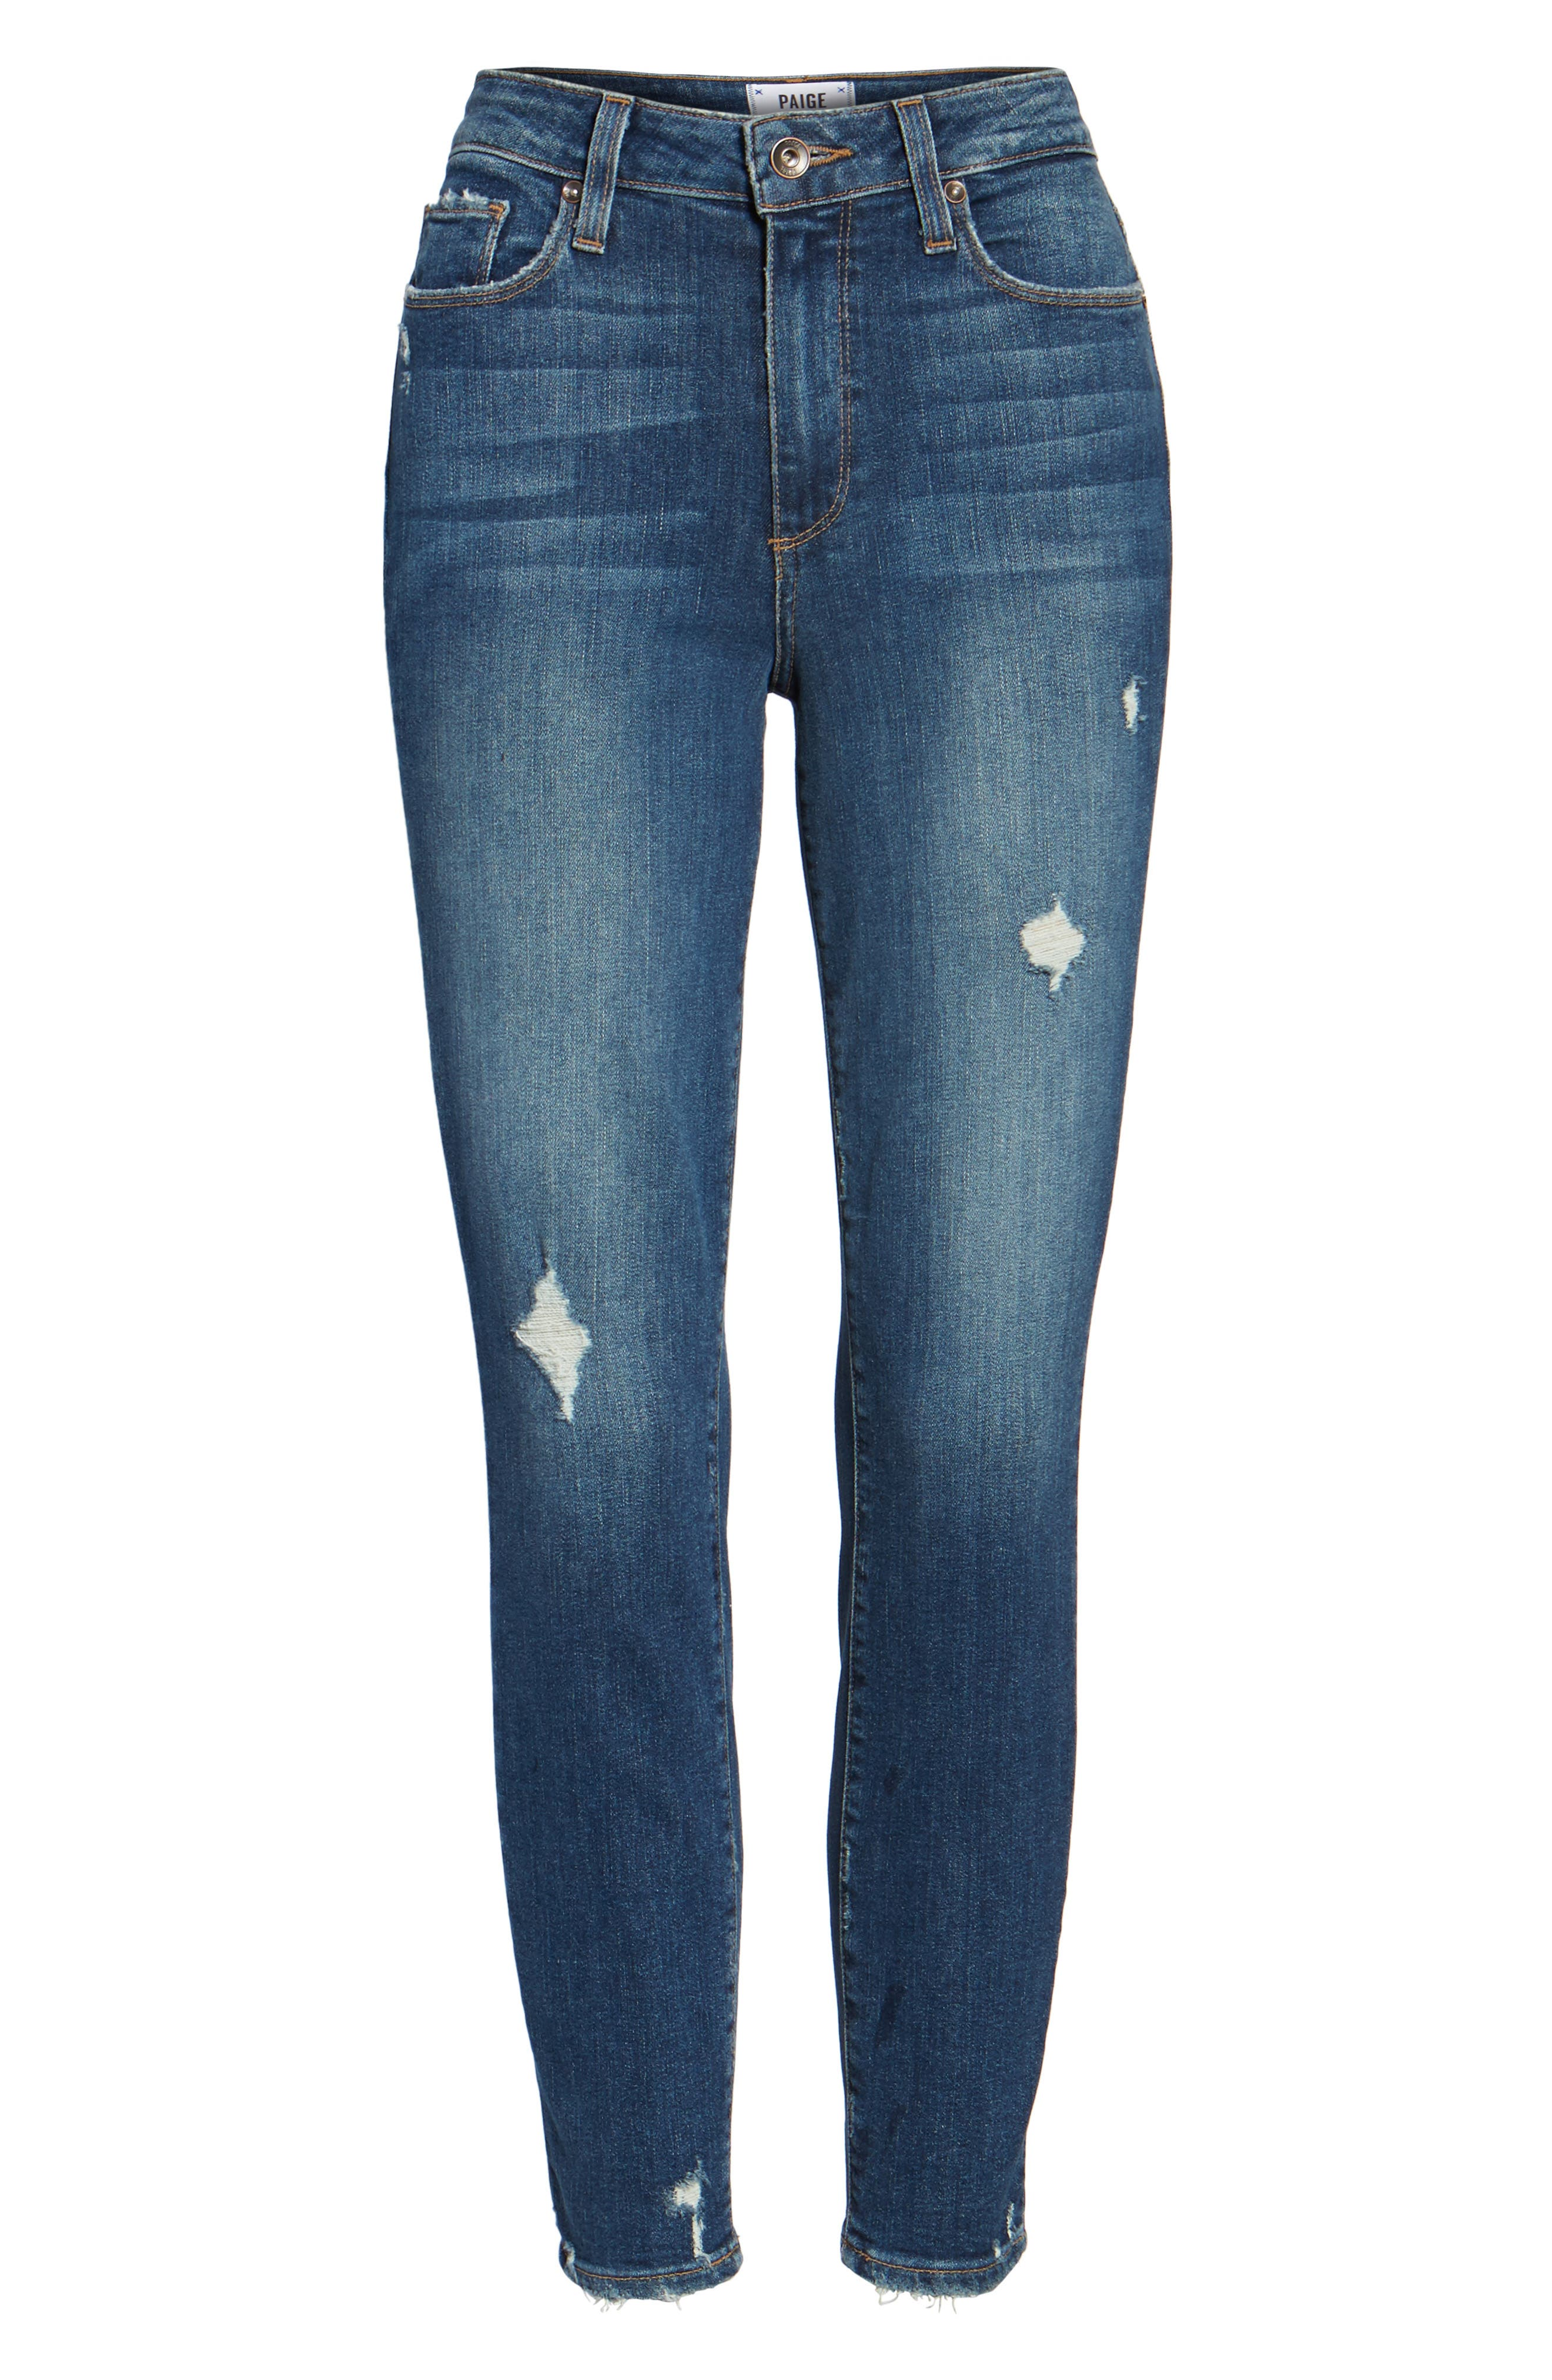 Transcend - Hoxton High Waist Crop Skinny Jeans,                             Alternate thumbnail 6, color,                             400